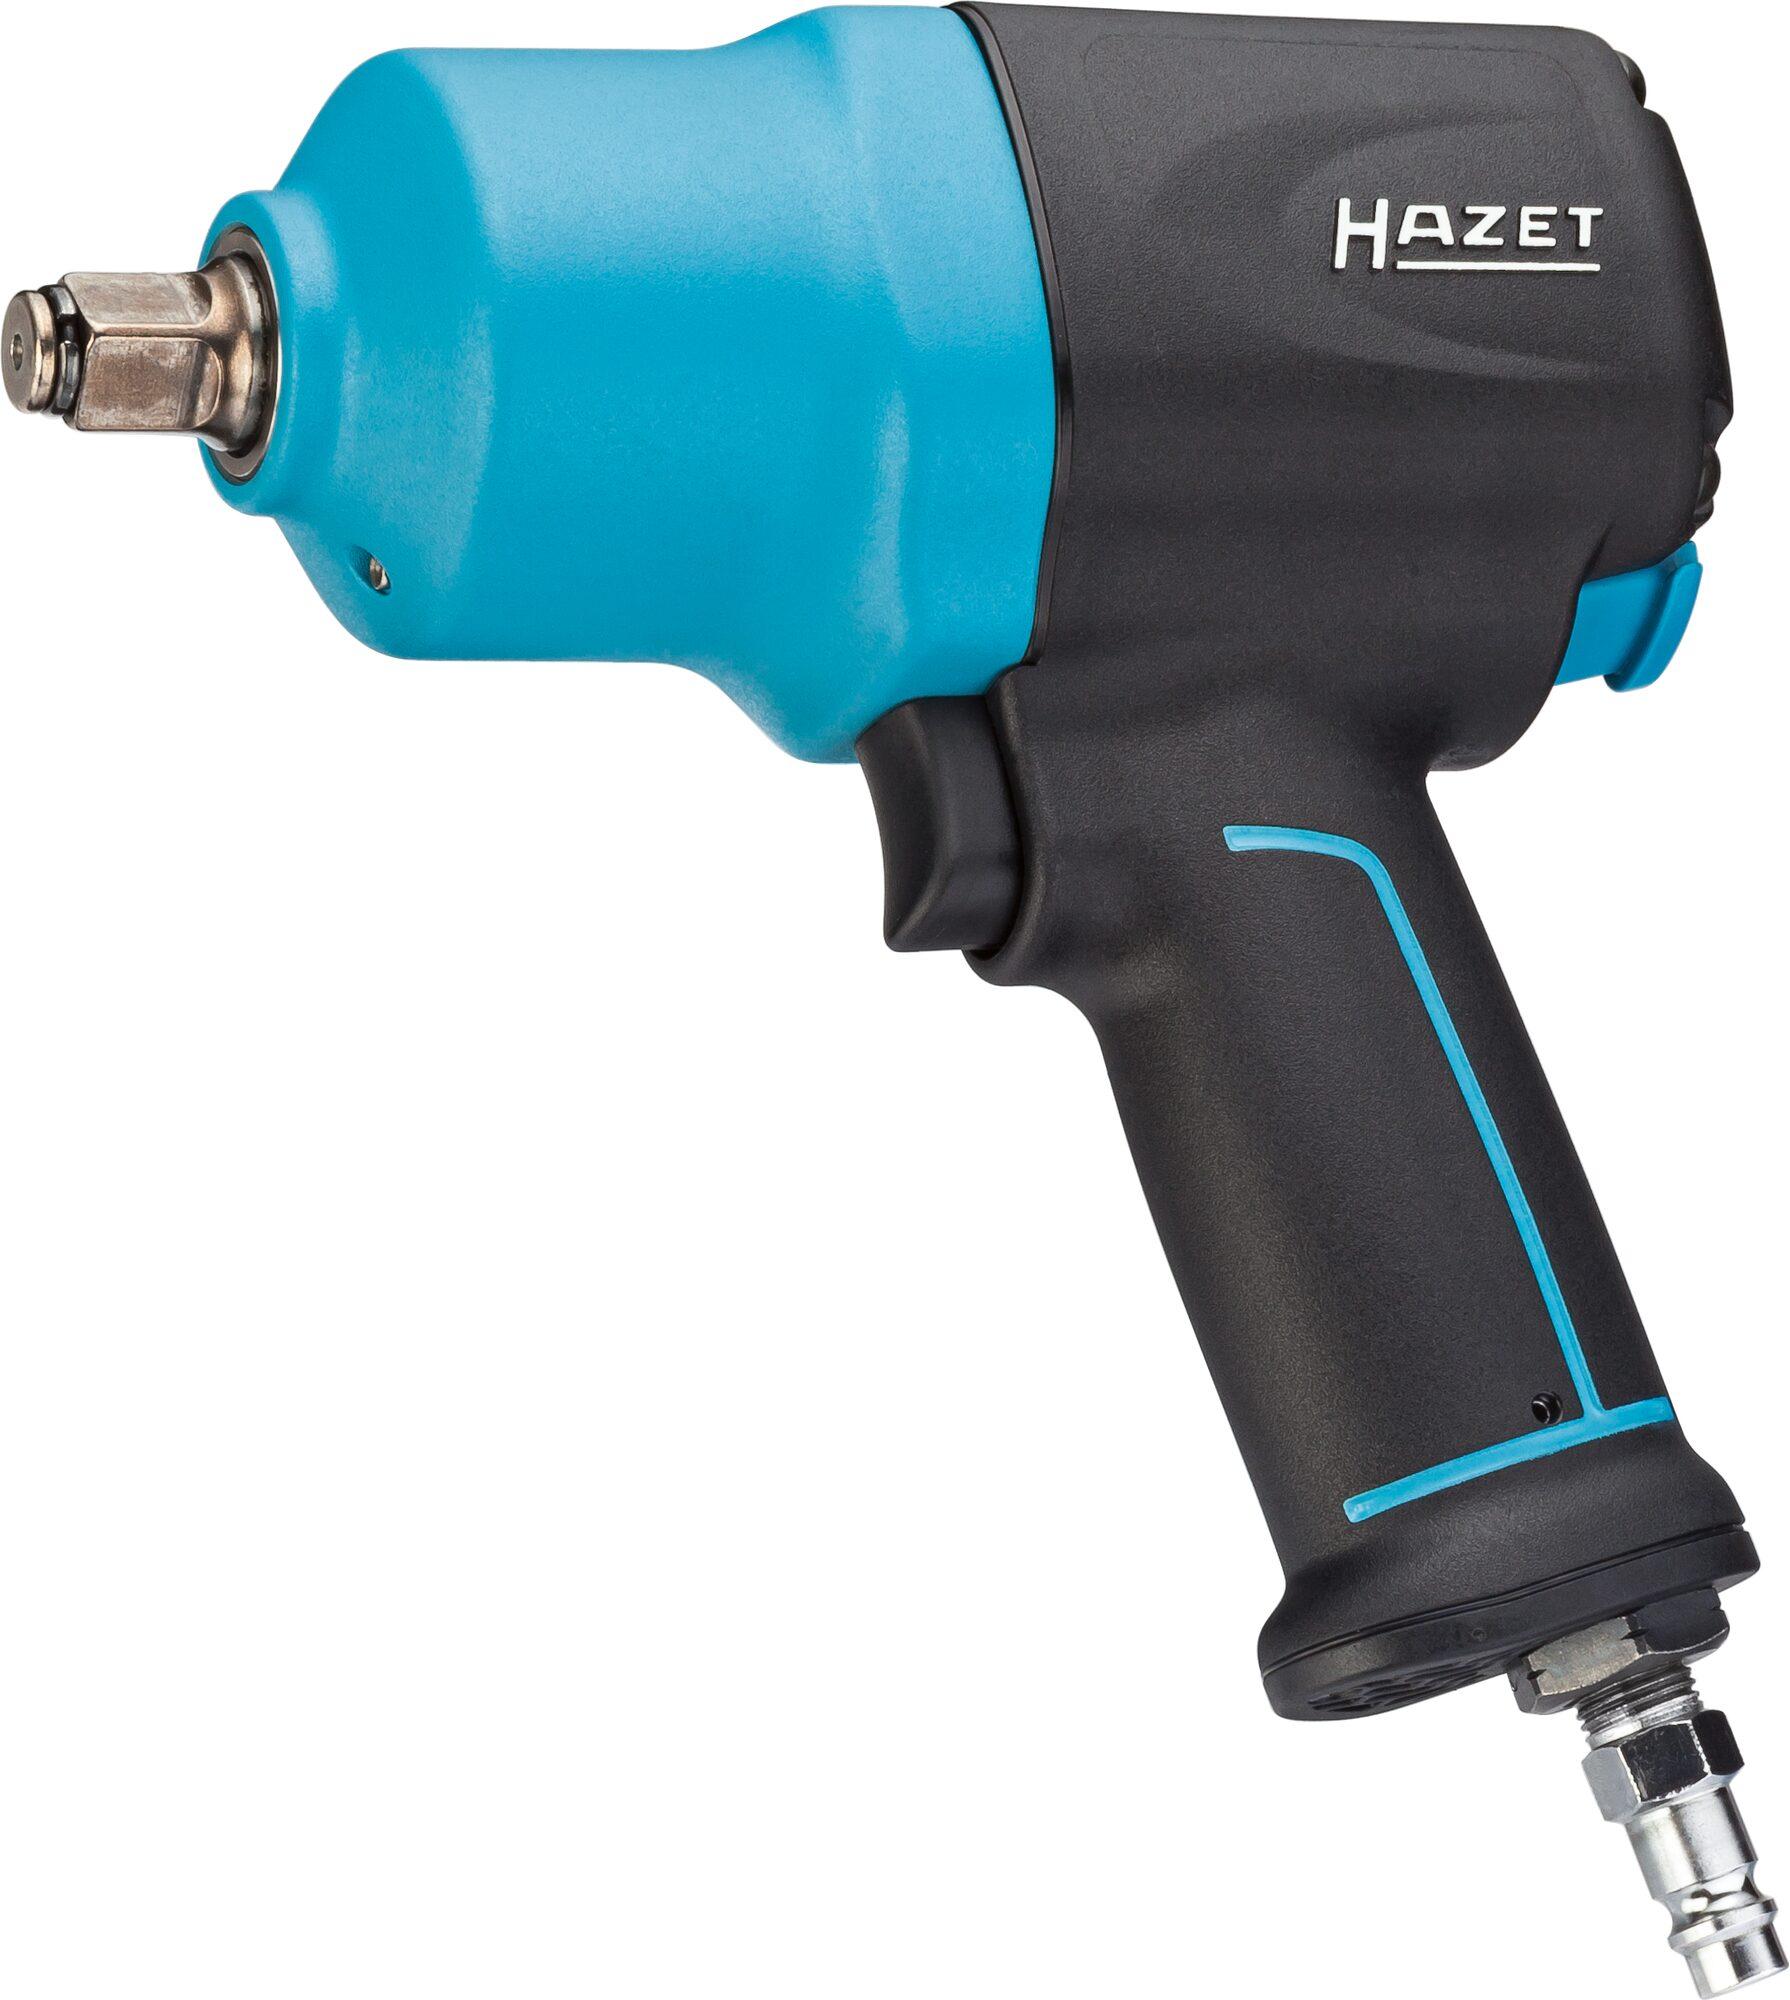 HAZET Schlagschrauber 9012EL-SPC ∙ Lösemoment maximal: 1700 Nm ∙ Vierkant massiv 12,5 mm (1/2 Zoll)